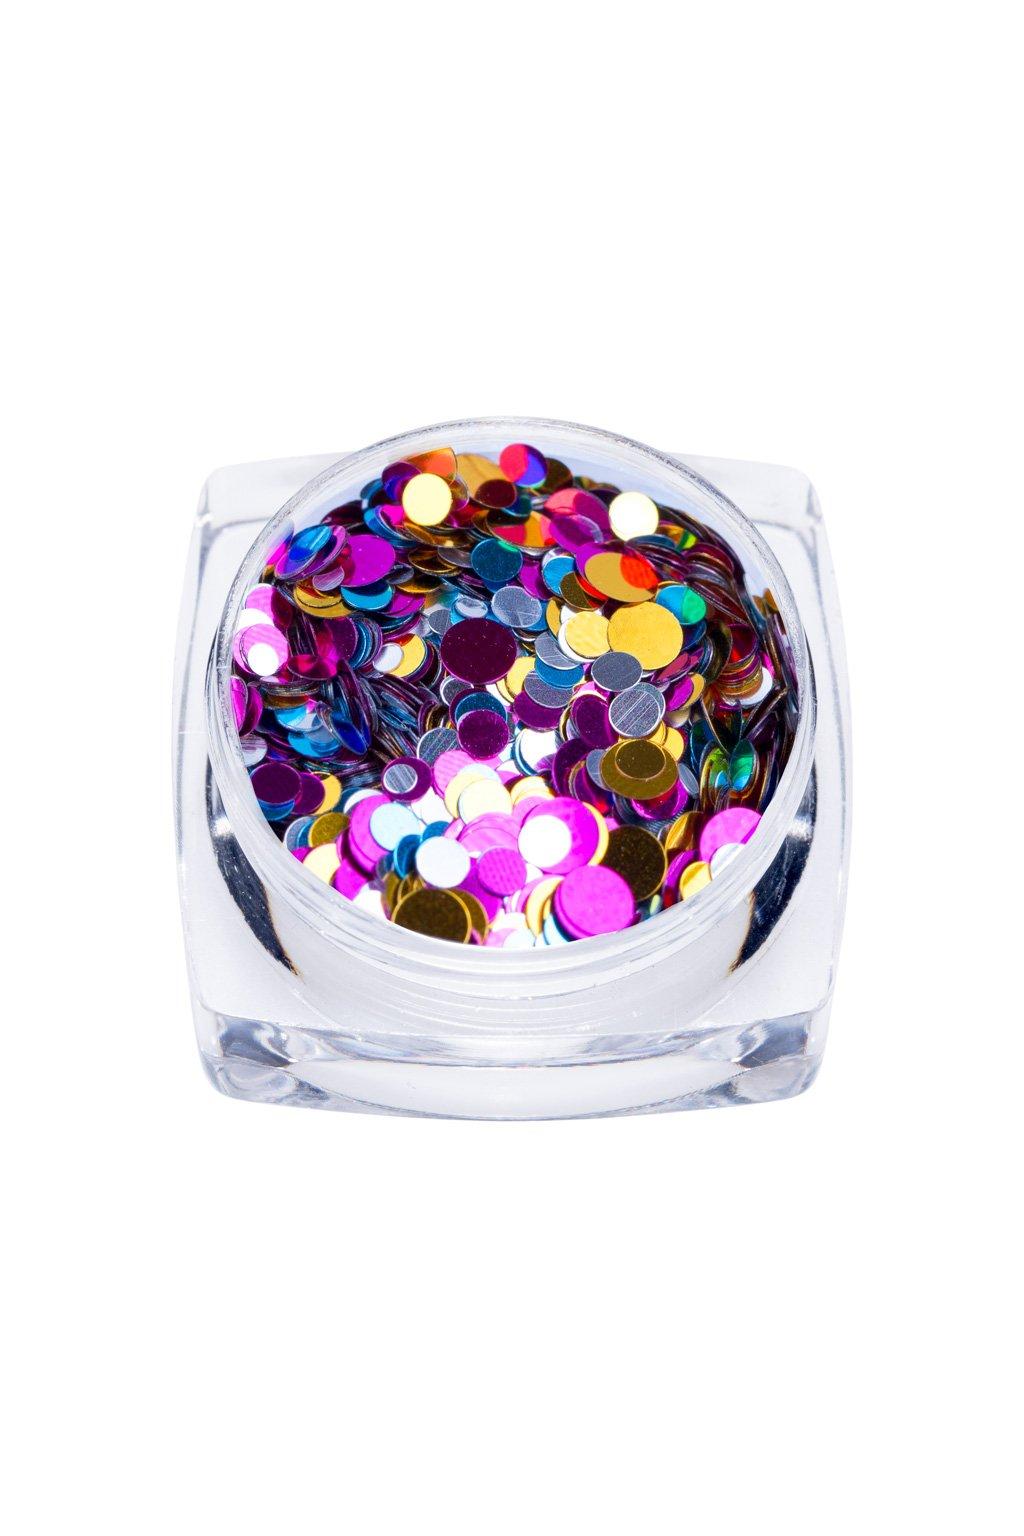 24068 minipihy chrome mix 9